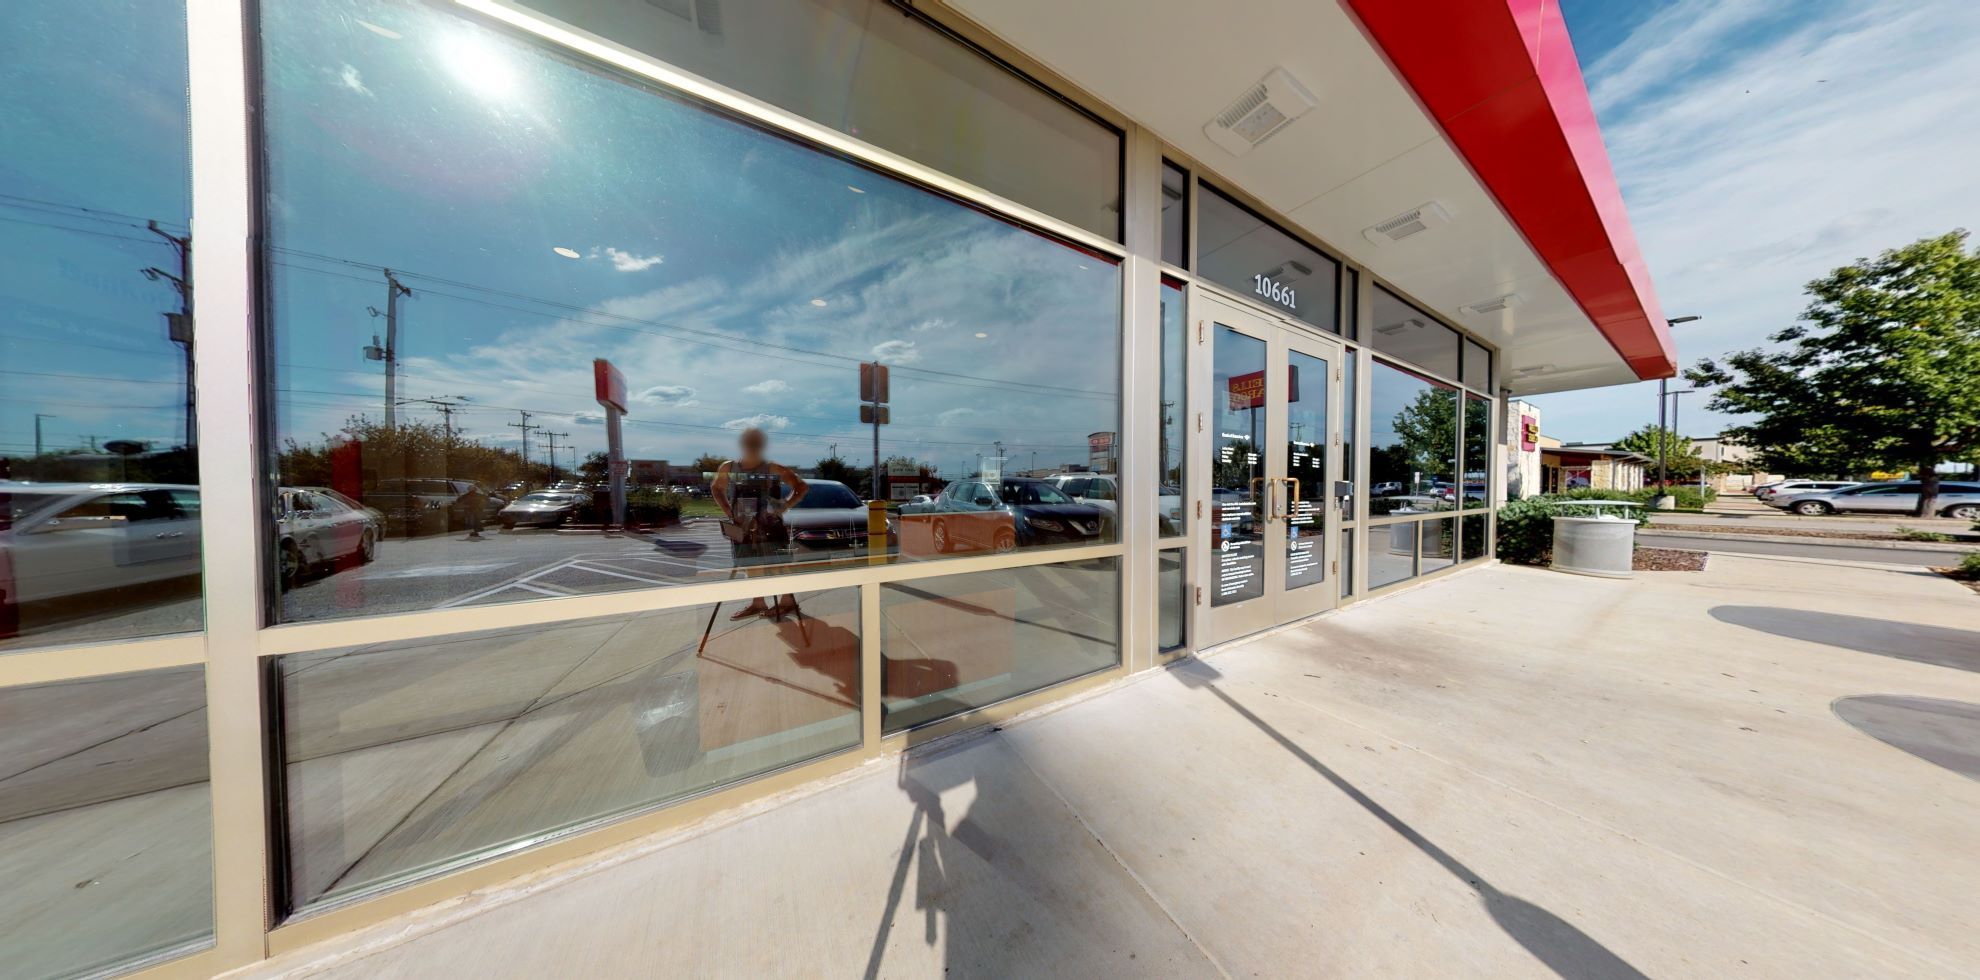 Bank of America financial center with drive-thru ATM   10661 Culebra Rd, San Antonio, TX 78251